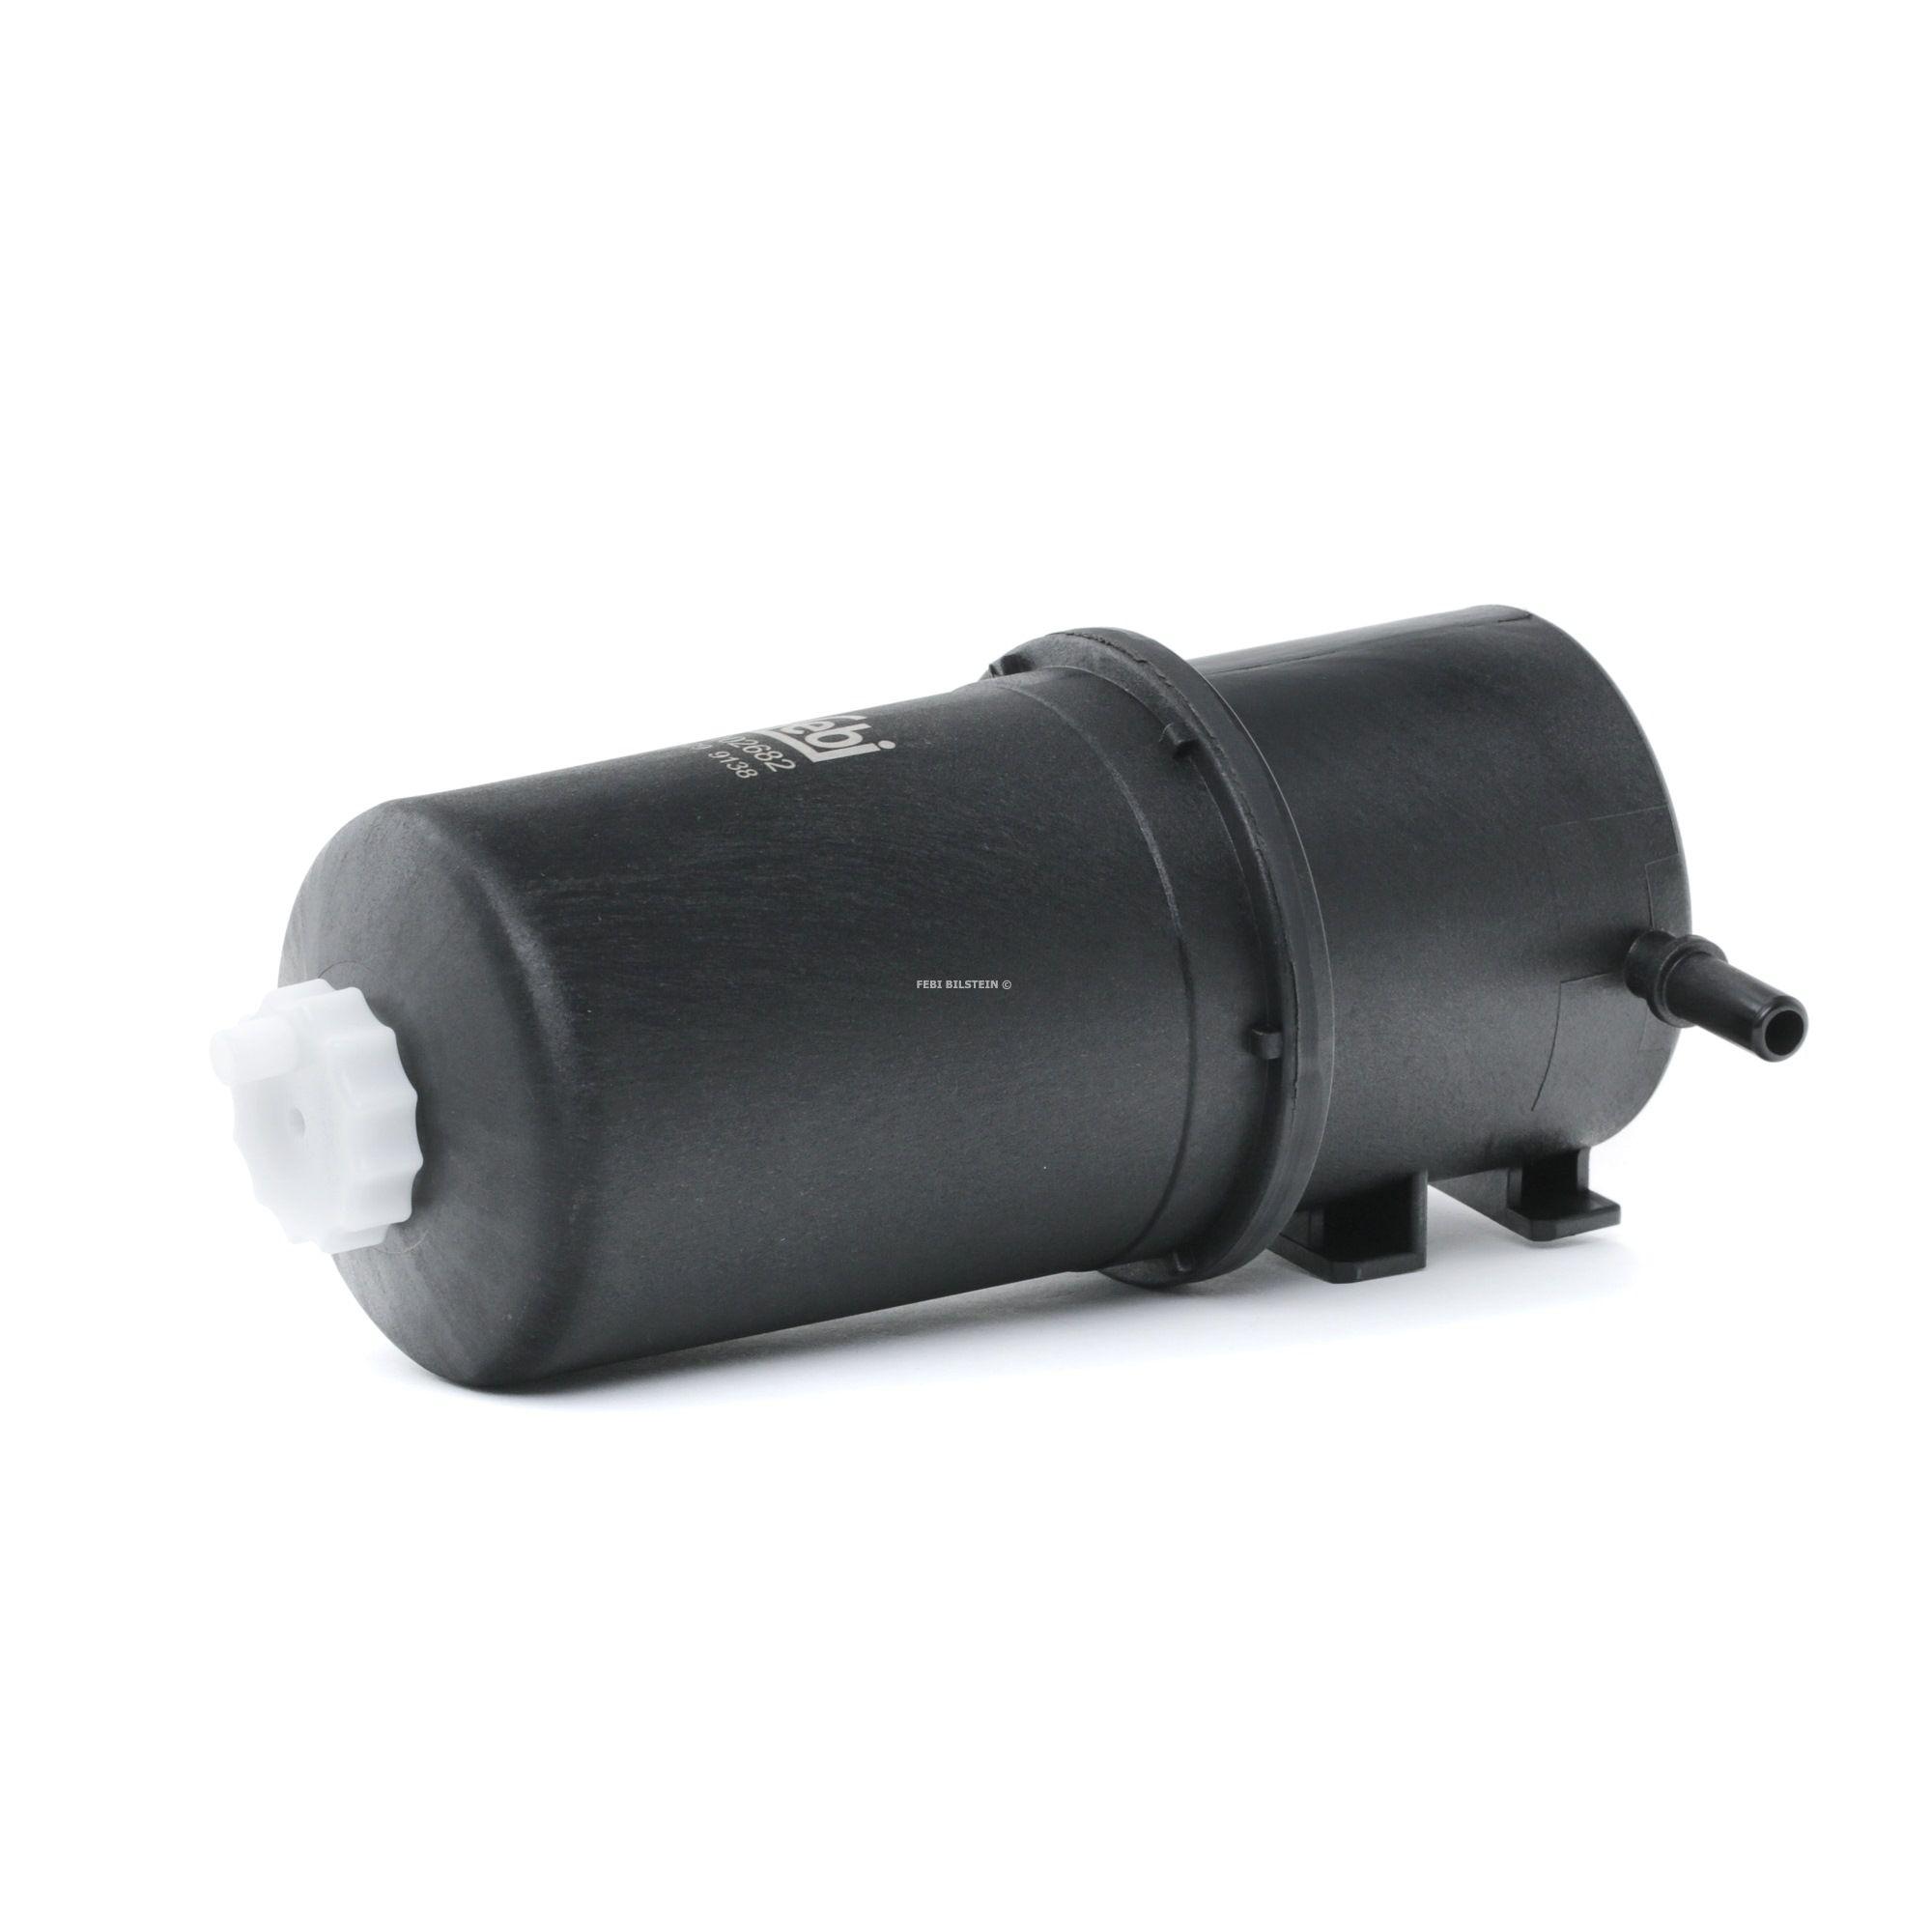 Fuel filter FEBI BILSTEIN 102682 rating